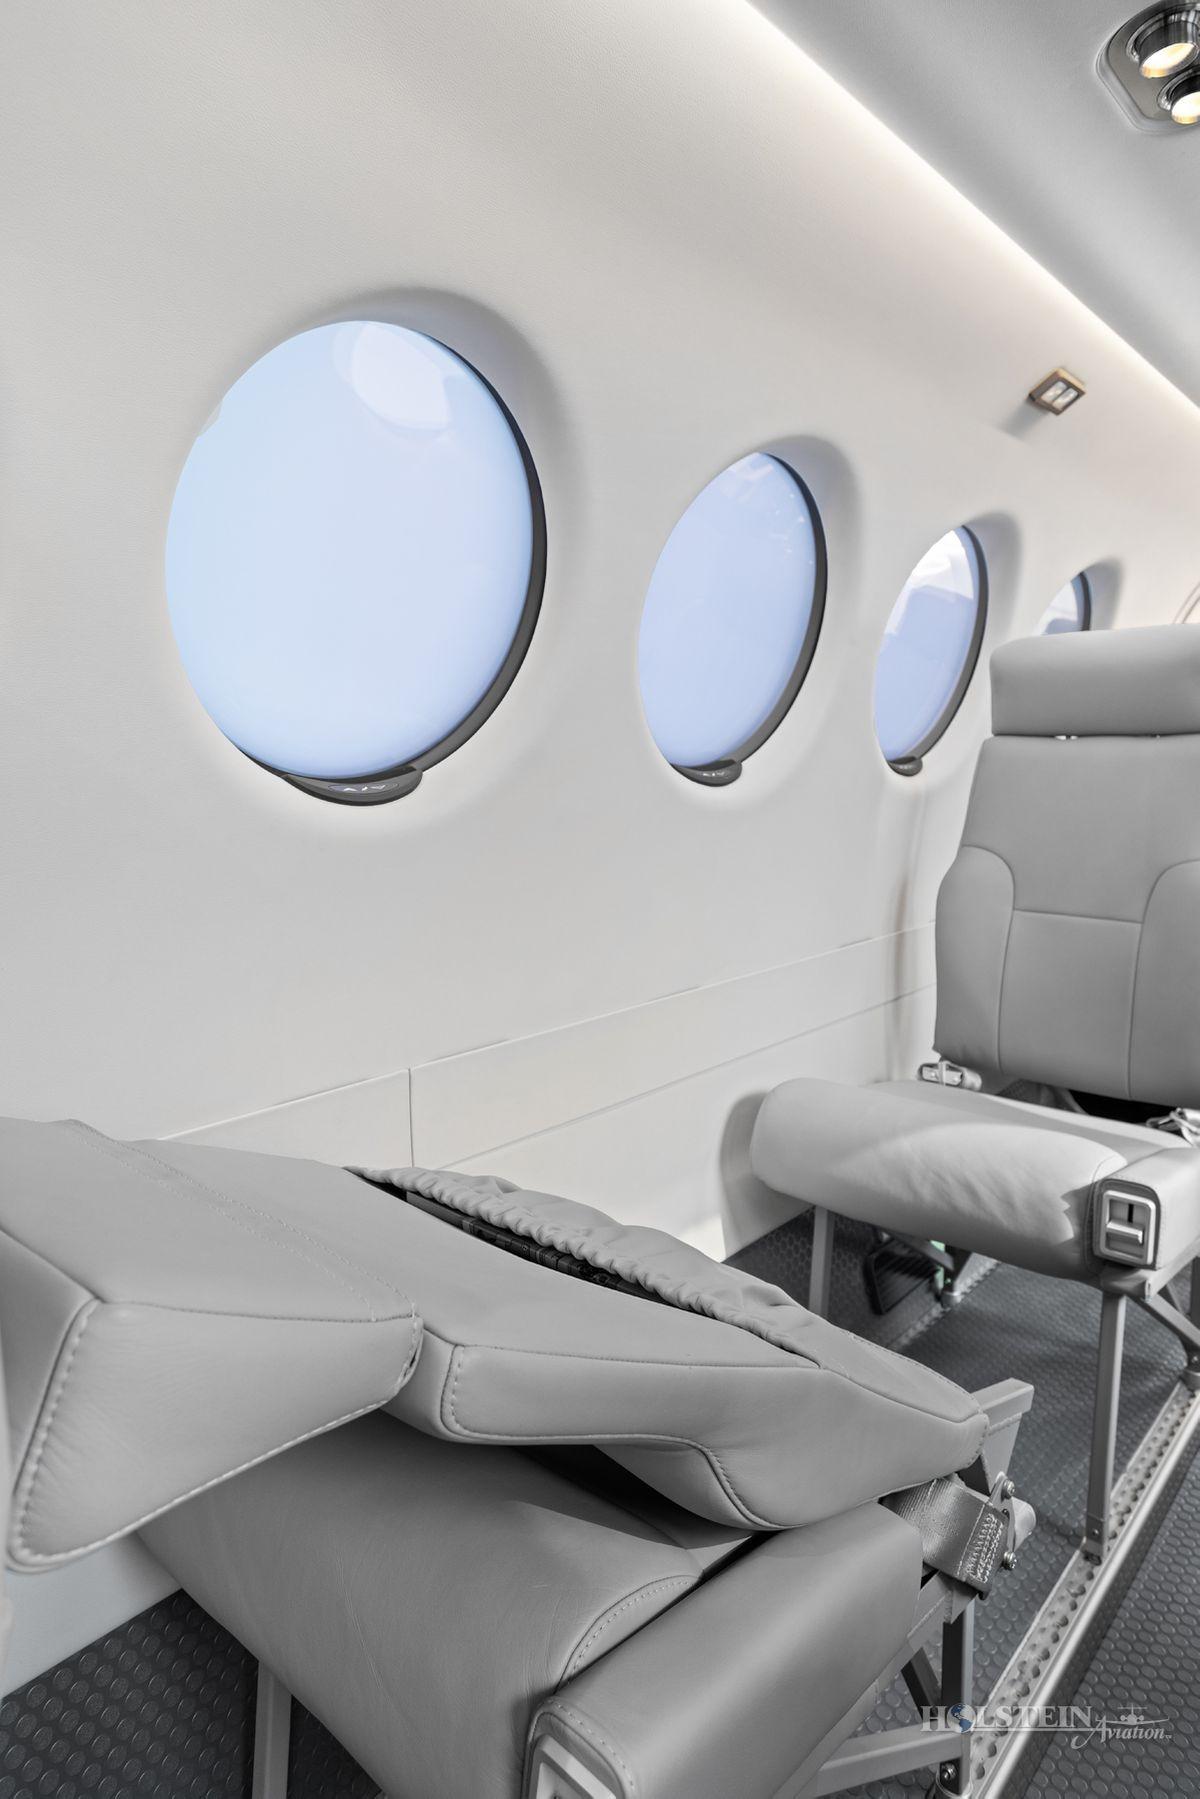 2018 King Air 350iER - FL-1157 - N1157F - Int - Seat Fold Down w-Armrest Down 3 RGB.jpg